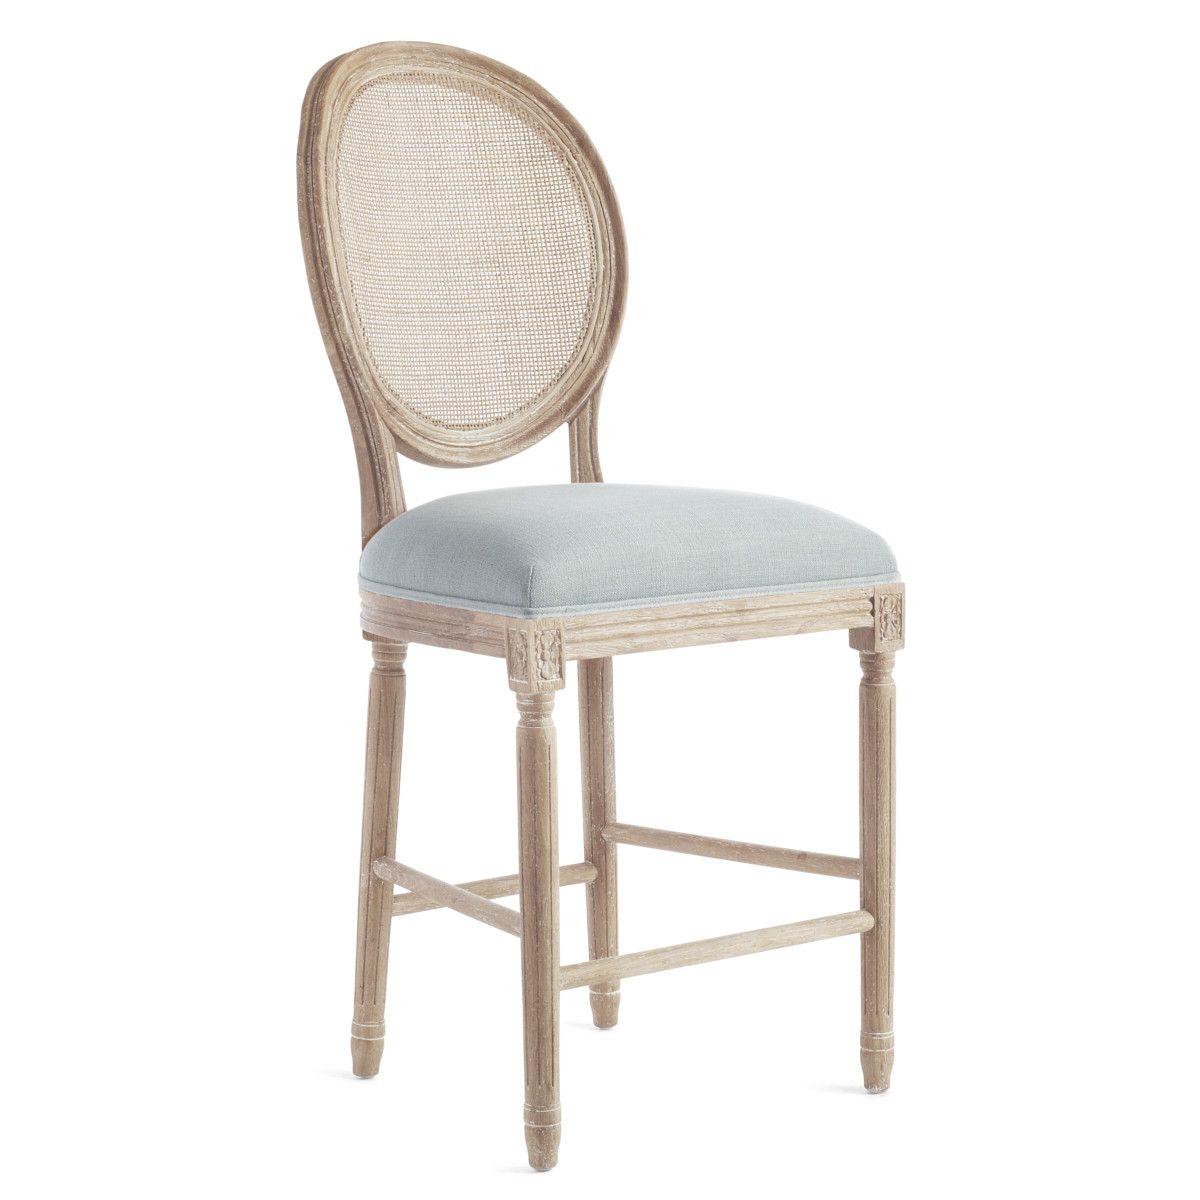 Louis Cane Back Stool Furniture Bar Furniture Cane Furniture